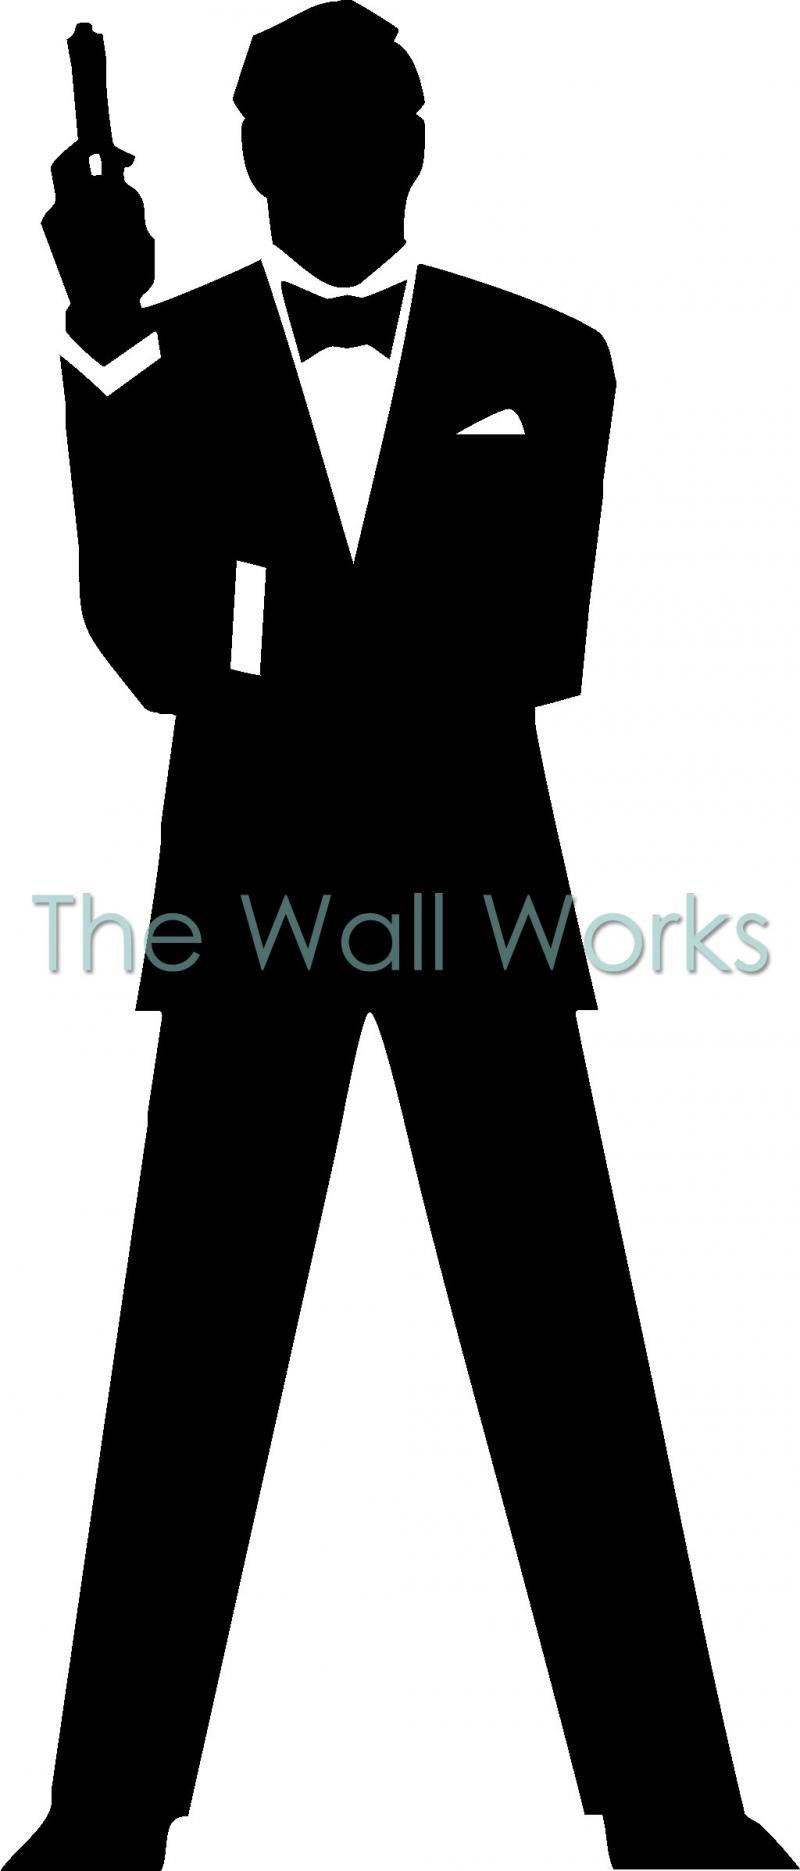 james bond 007 silhouette vinyl decal